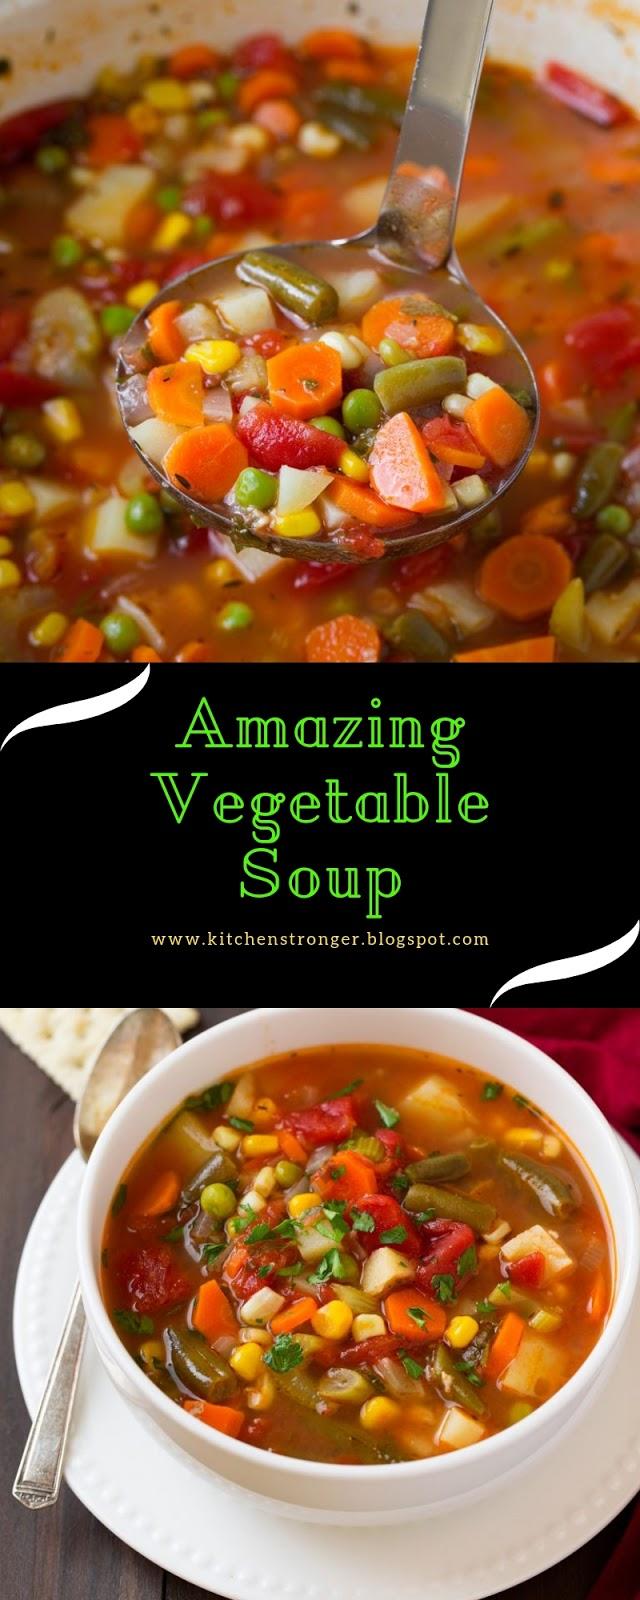 Amazing Vegetable Soup